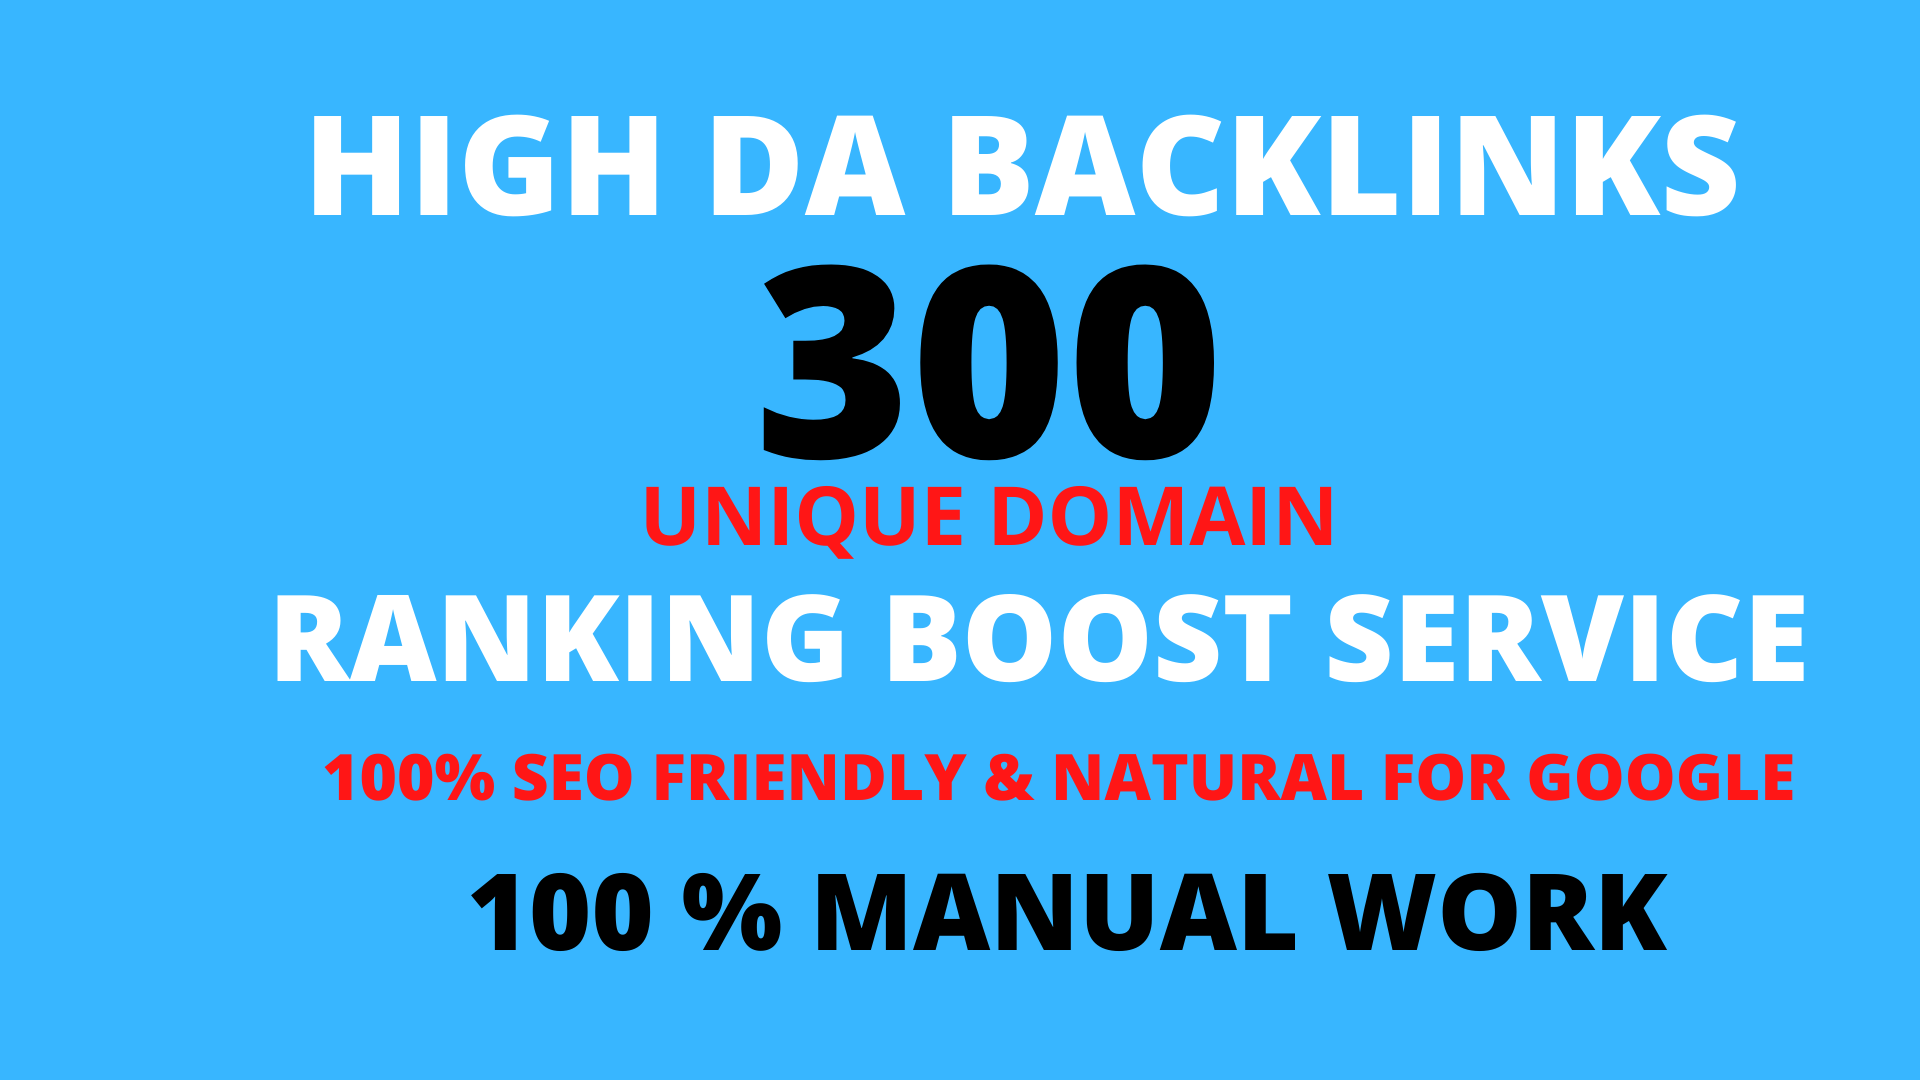 Create manually 300 High DA profile backlinks